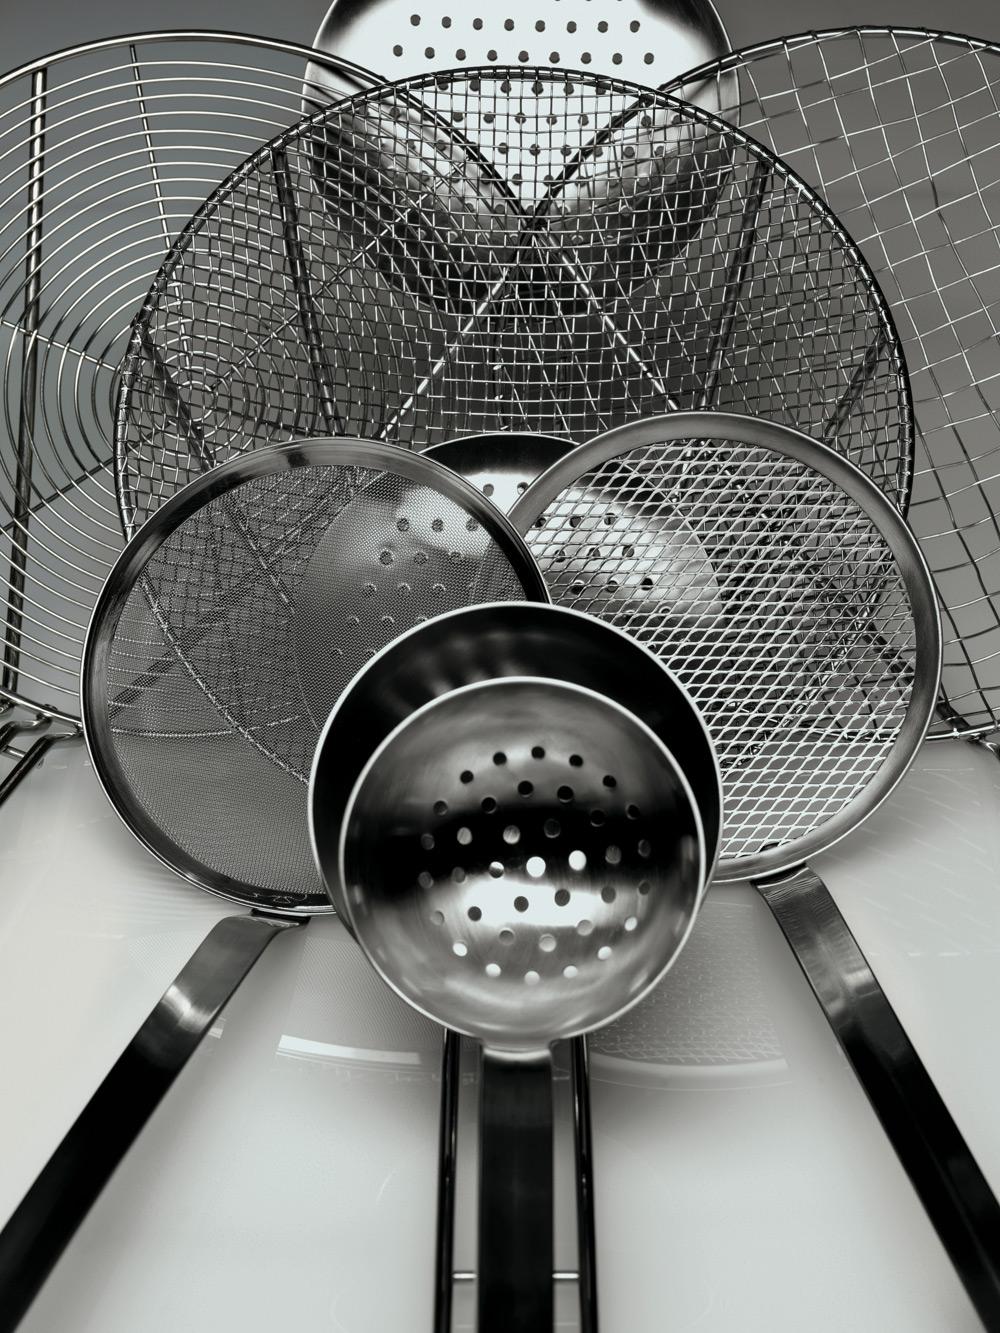 Paderno-keukenbenodigdheden-spatels